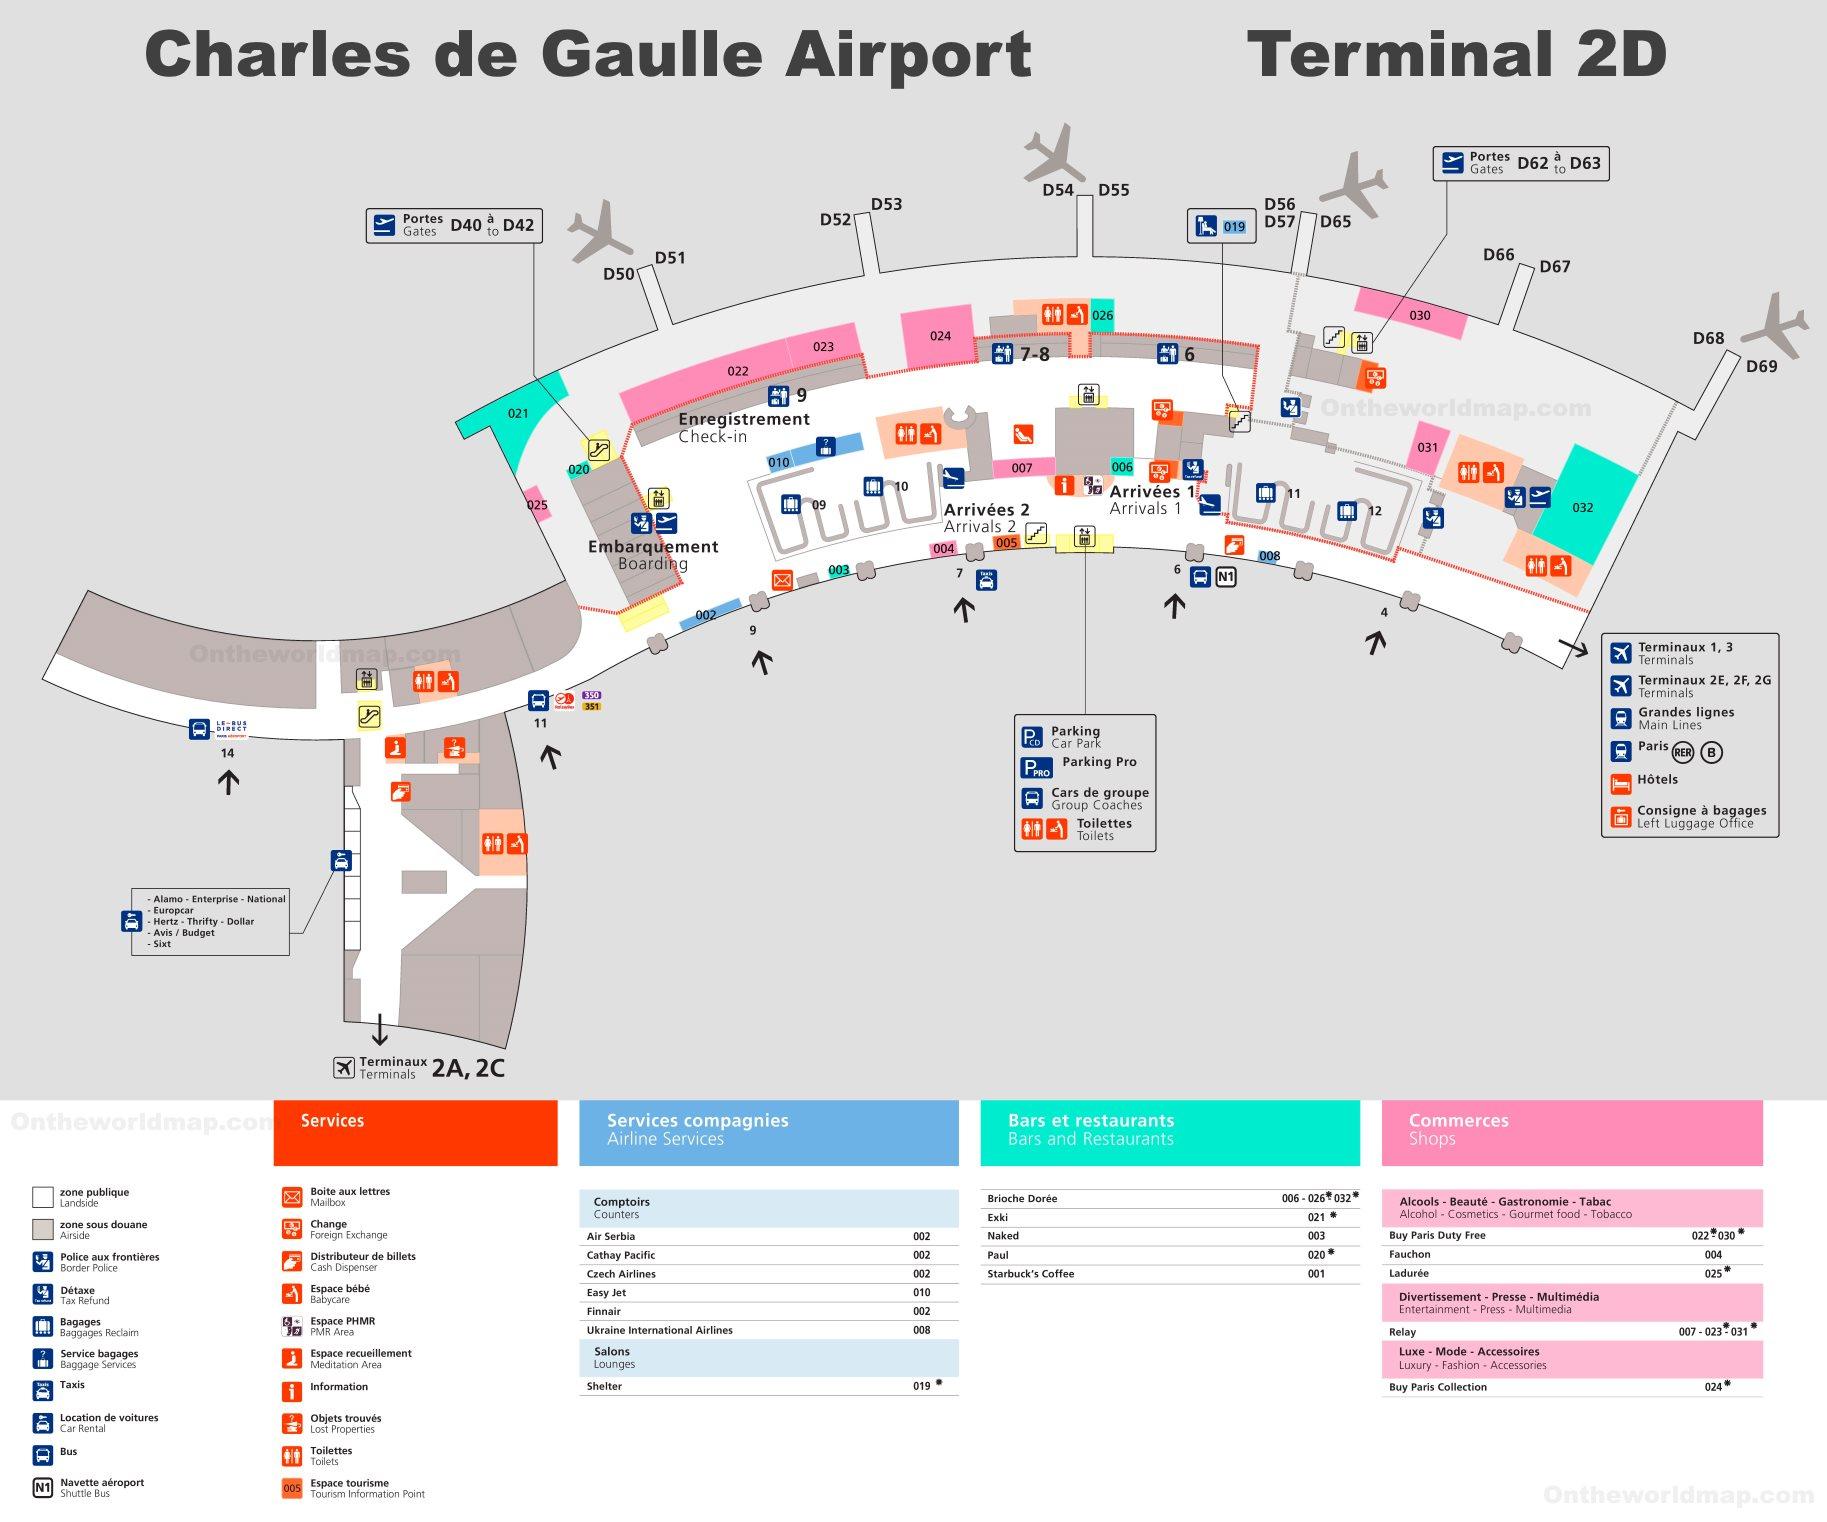 cdg terminal 2d map Charles De Gaulle Airport Terminal 2d Map cdg terminal 2d map